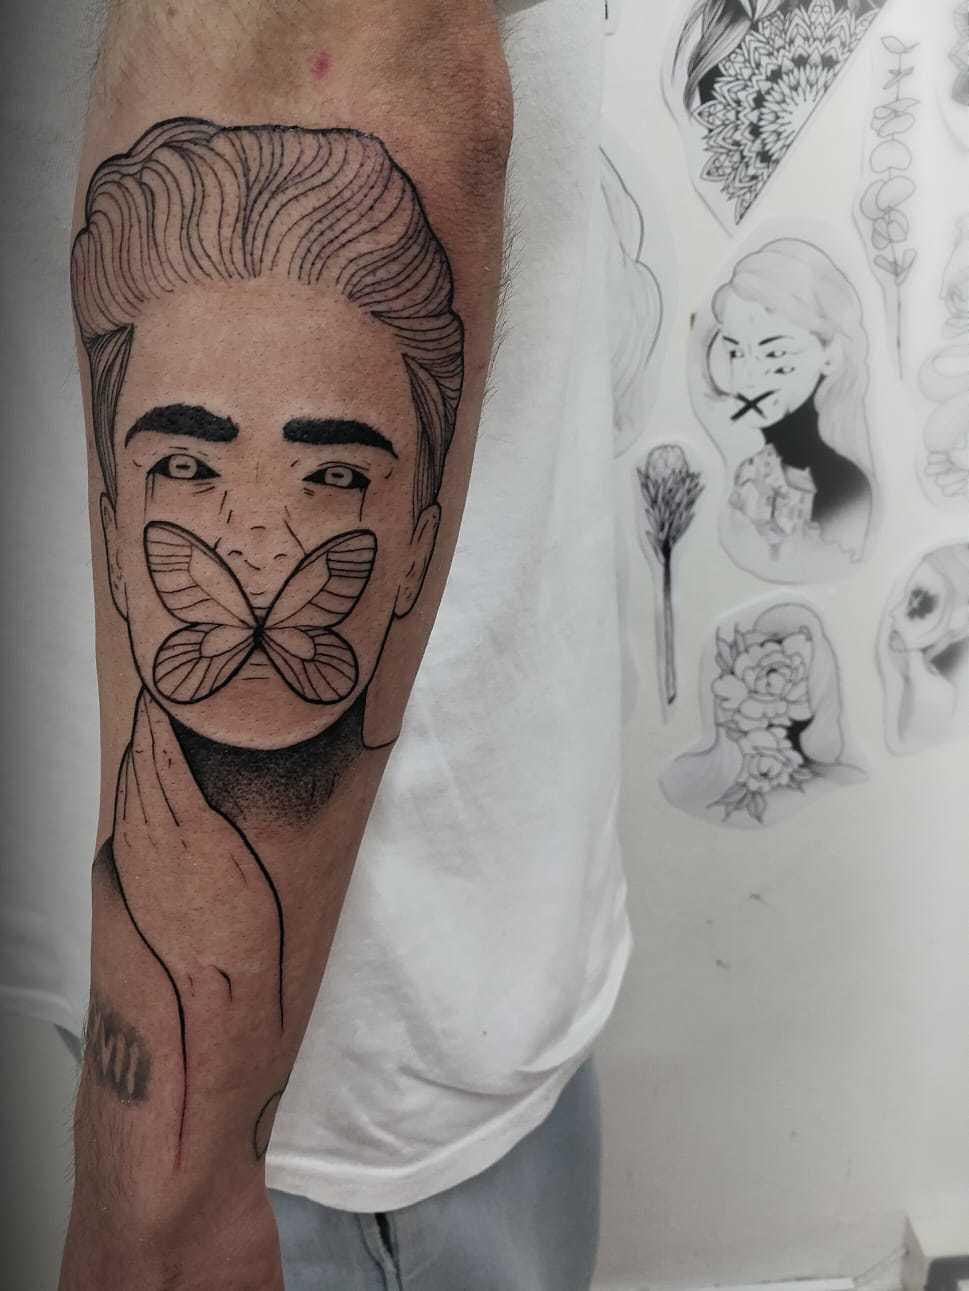 Ligera-ink-tattoo-milano-tatuaggi-milano-migliori-tatuatori-milano-tatuaggi-blackwork-milano-tattoo-blackwork-milano-tattoo-avangarde-10